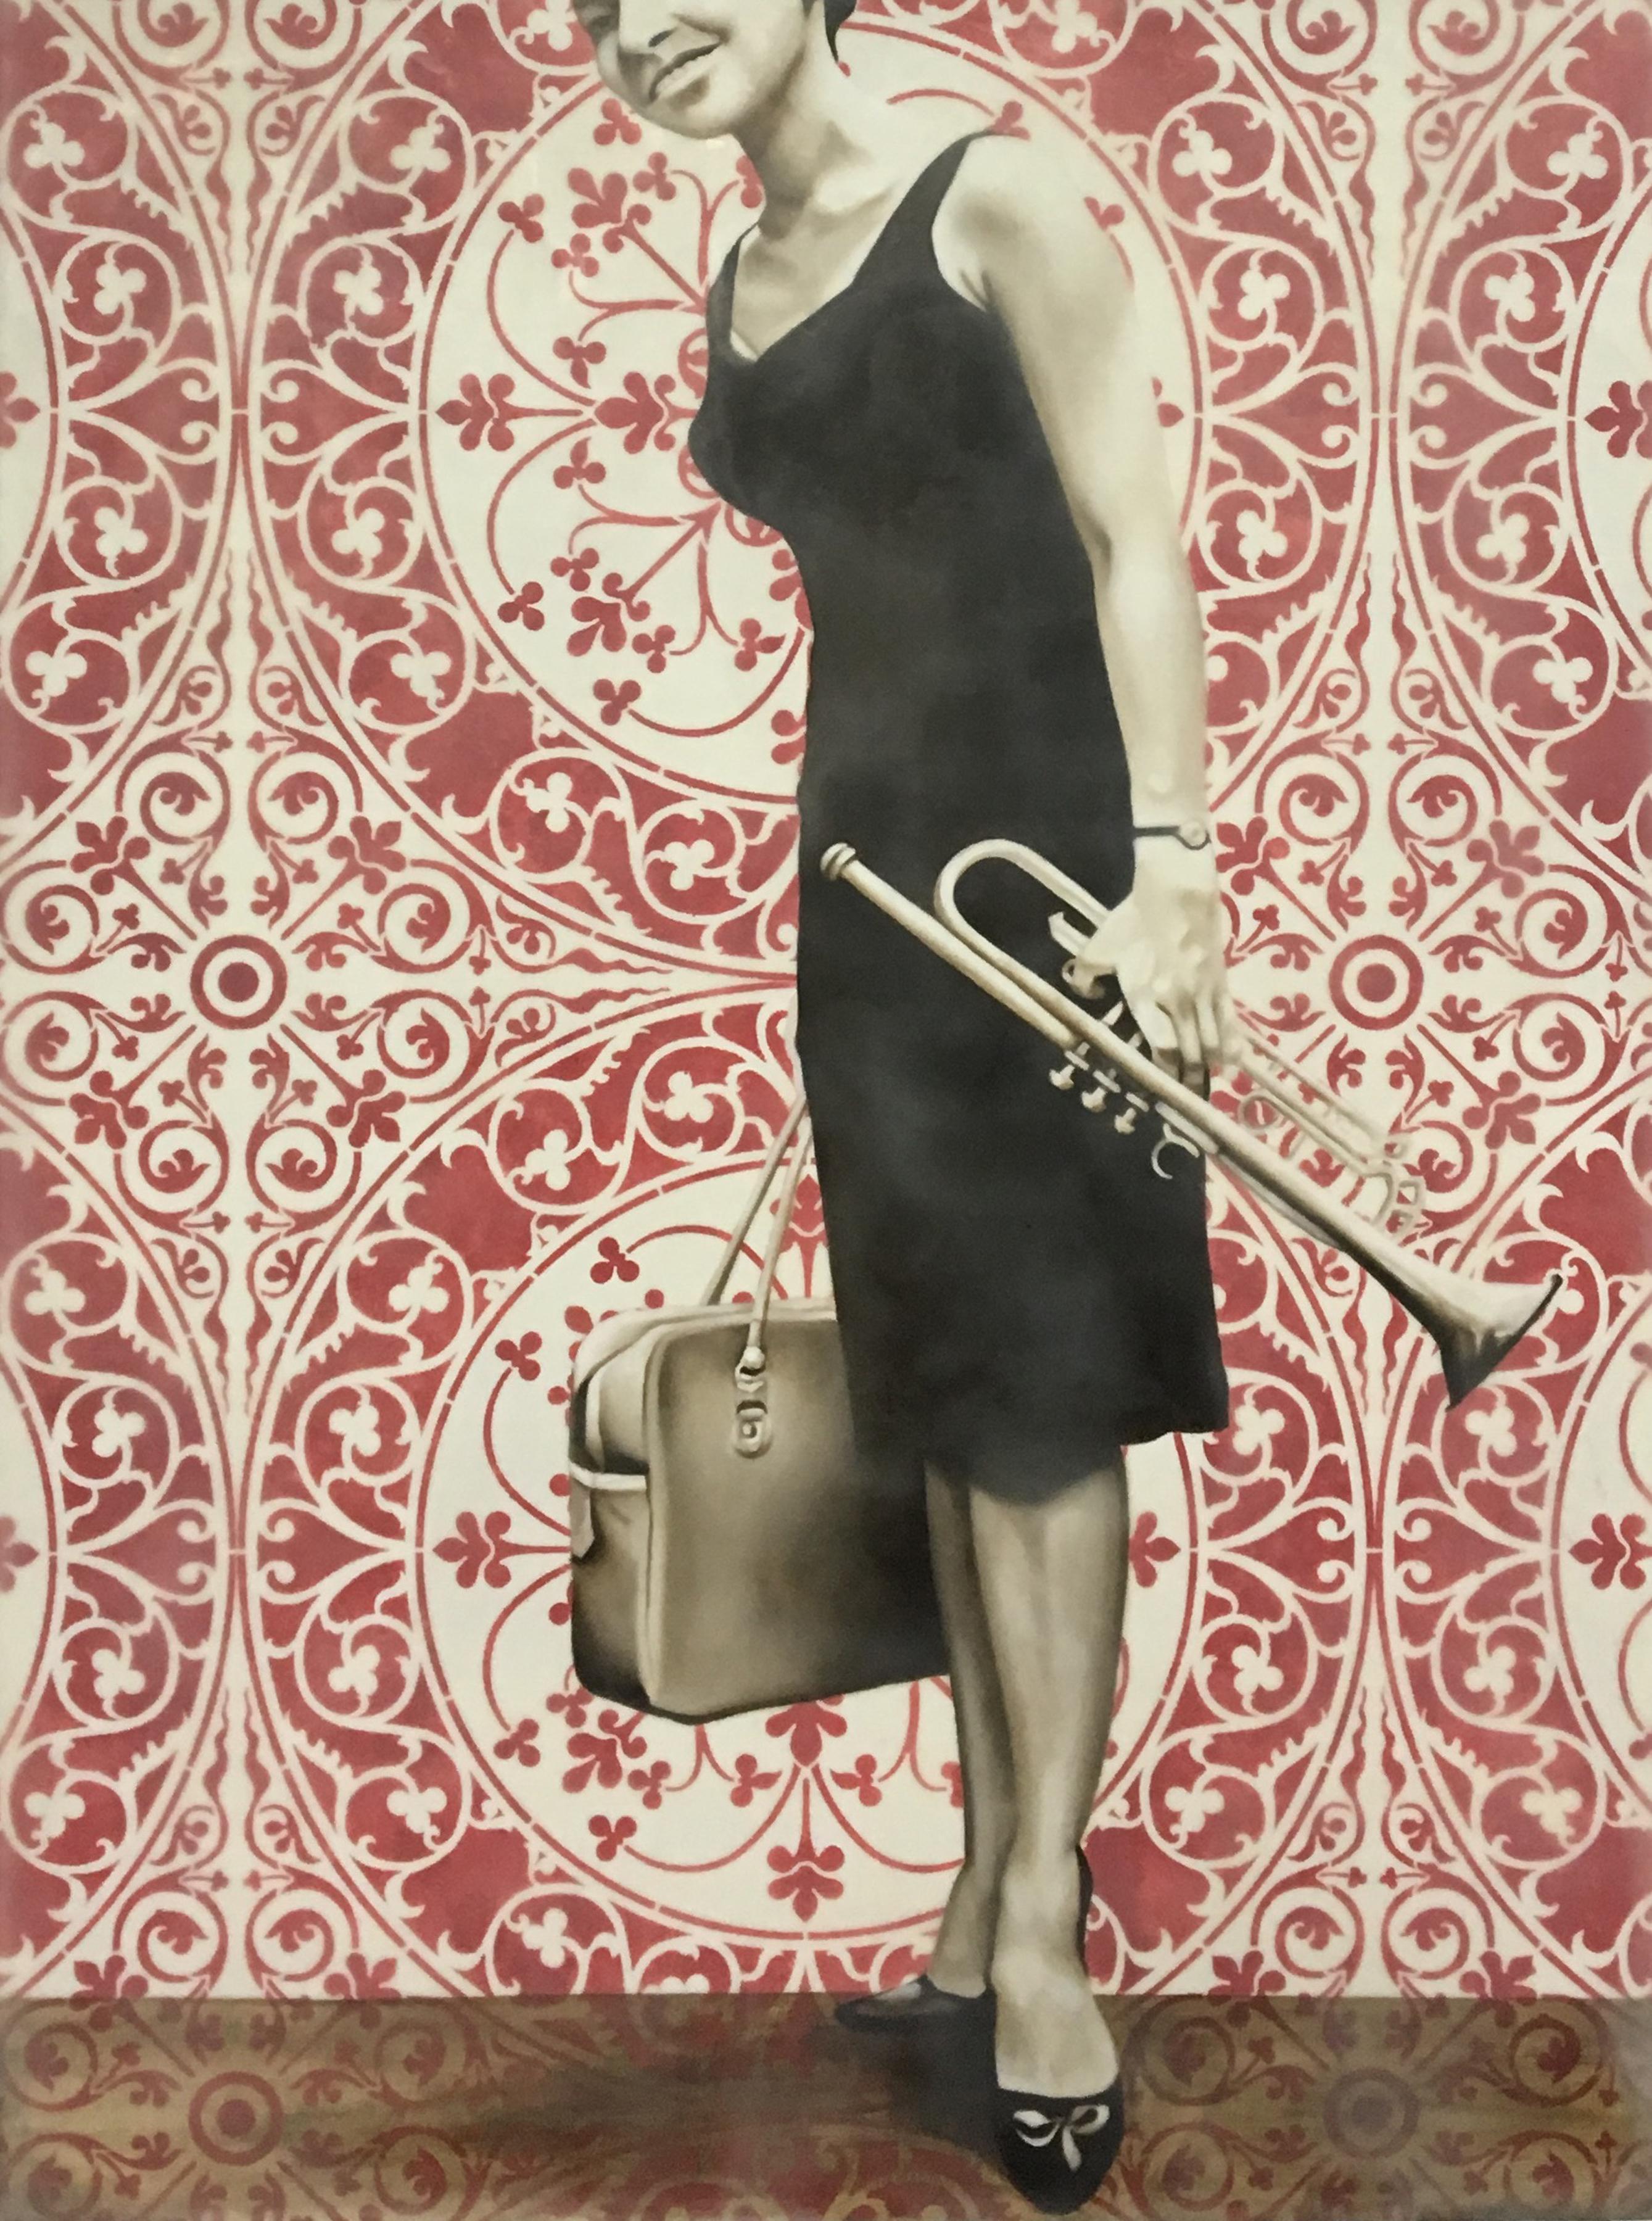 The Trumpeter Alvarado